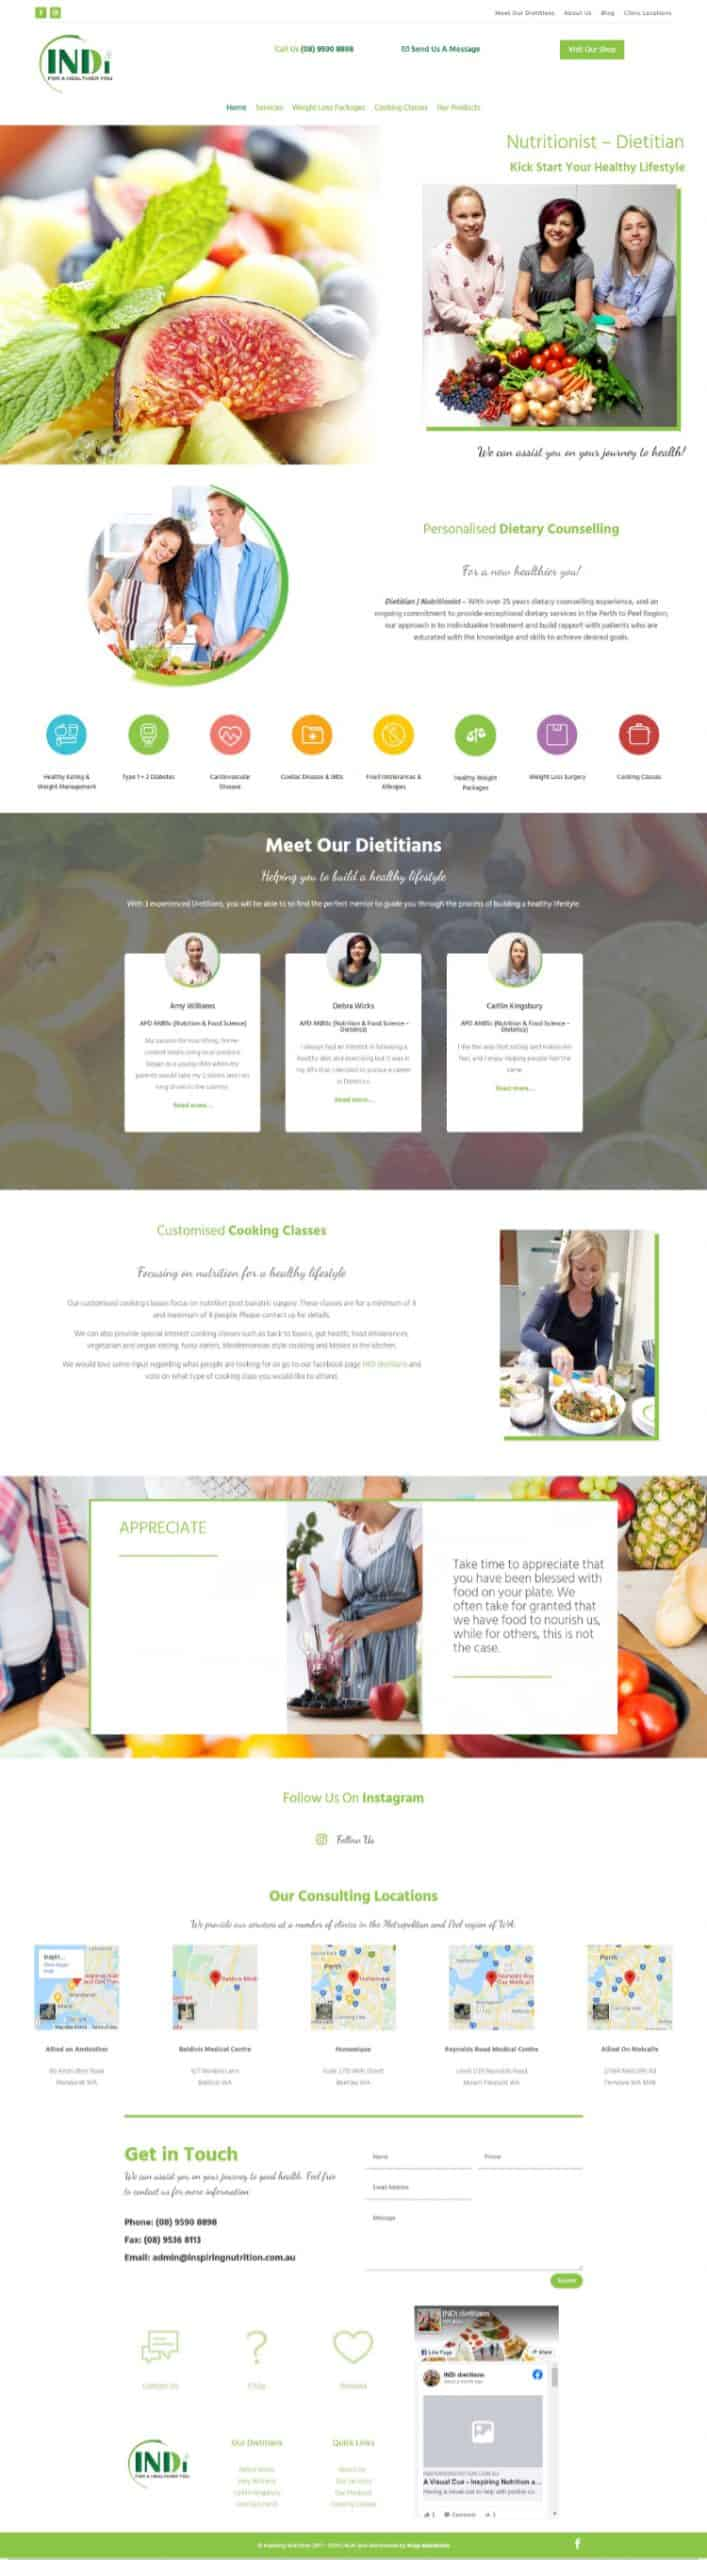 Inspiring Nutrition Dietitian